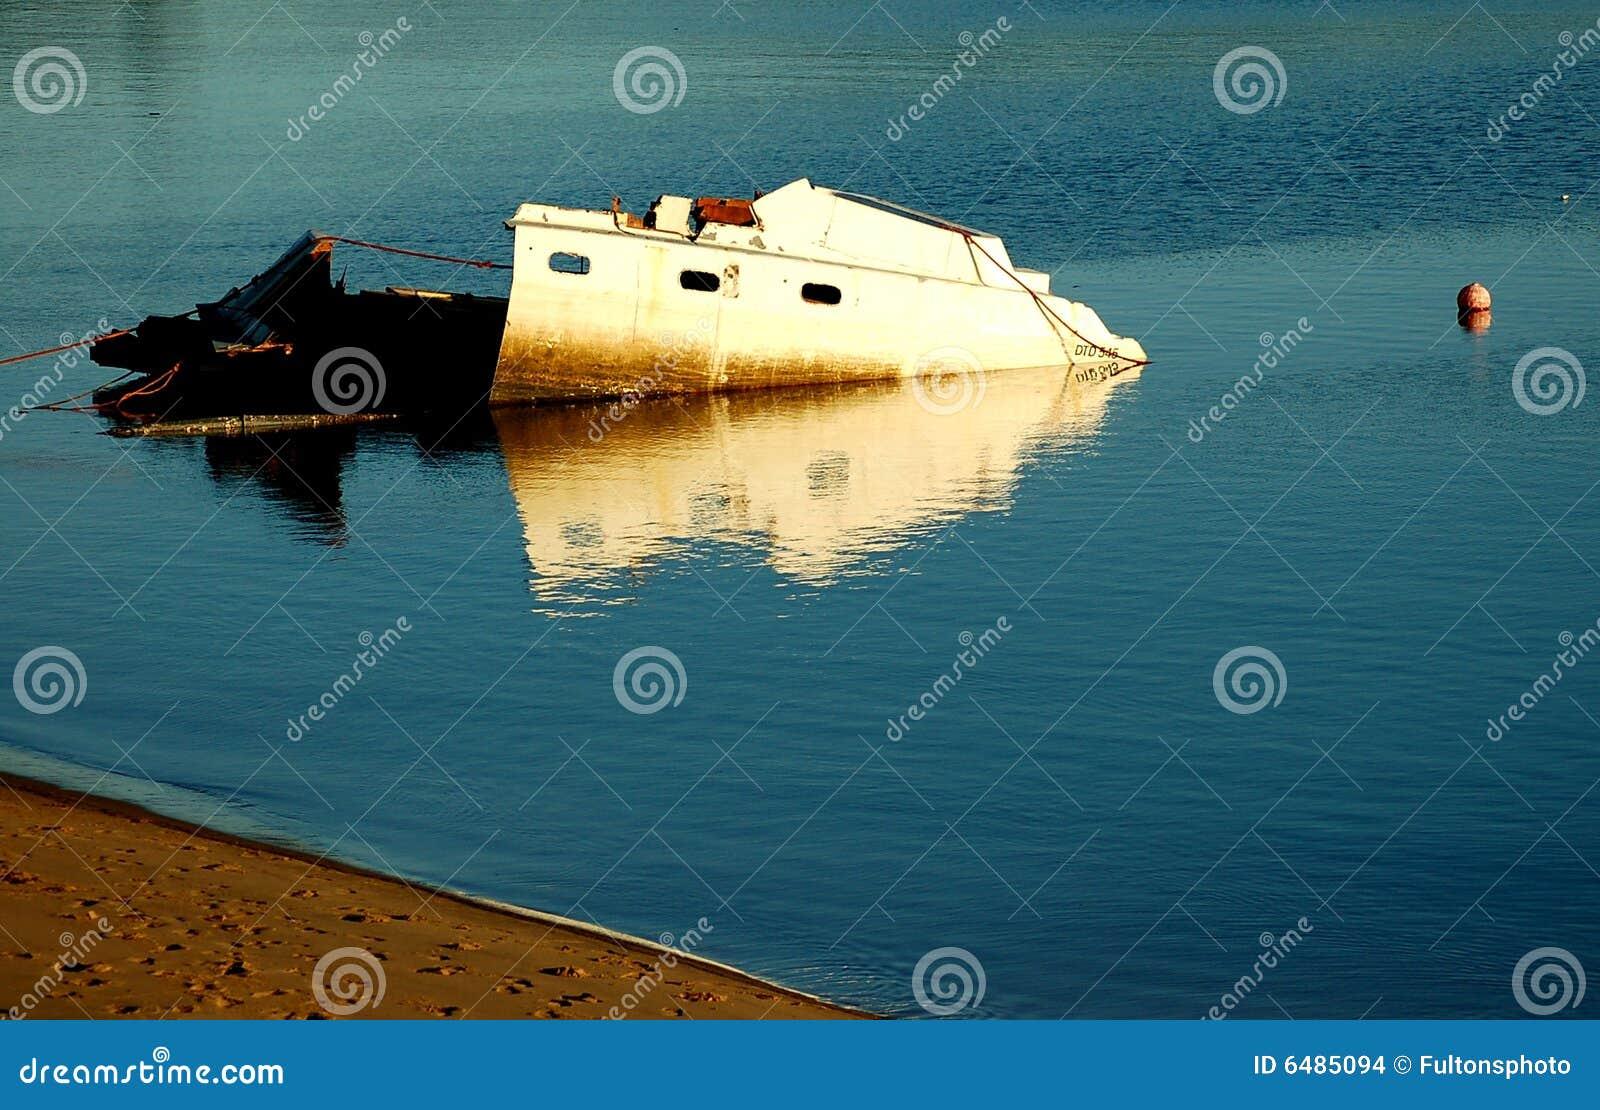 Damaged Ship Wreck